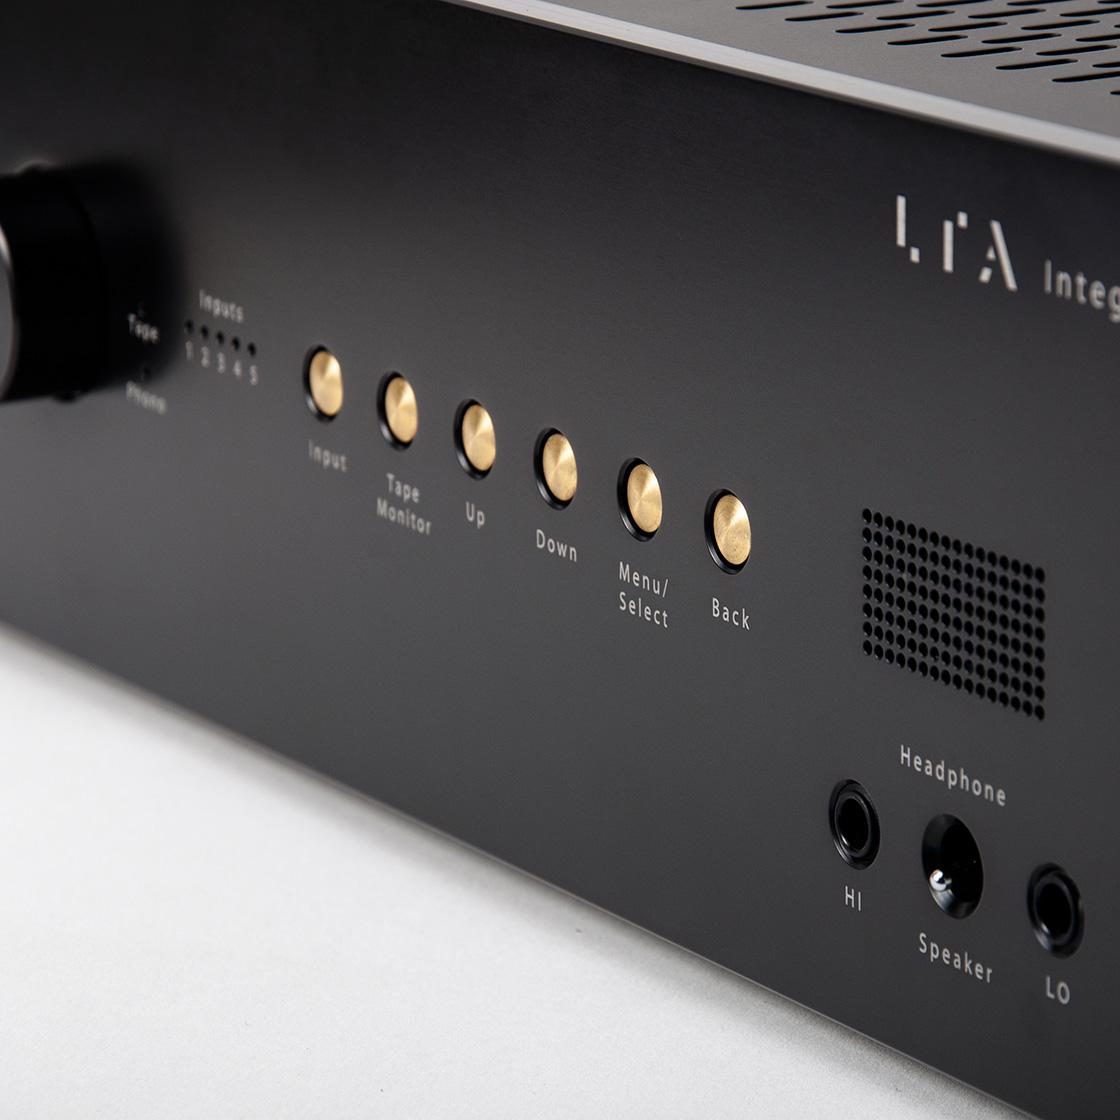 LTA Integrated Amp Detail.jpg